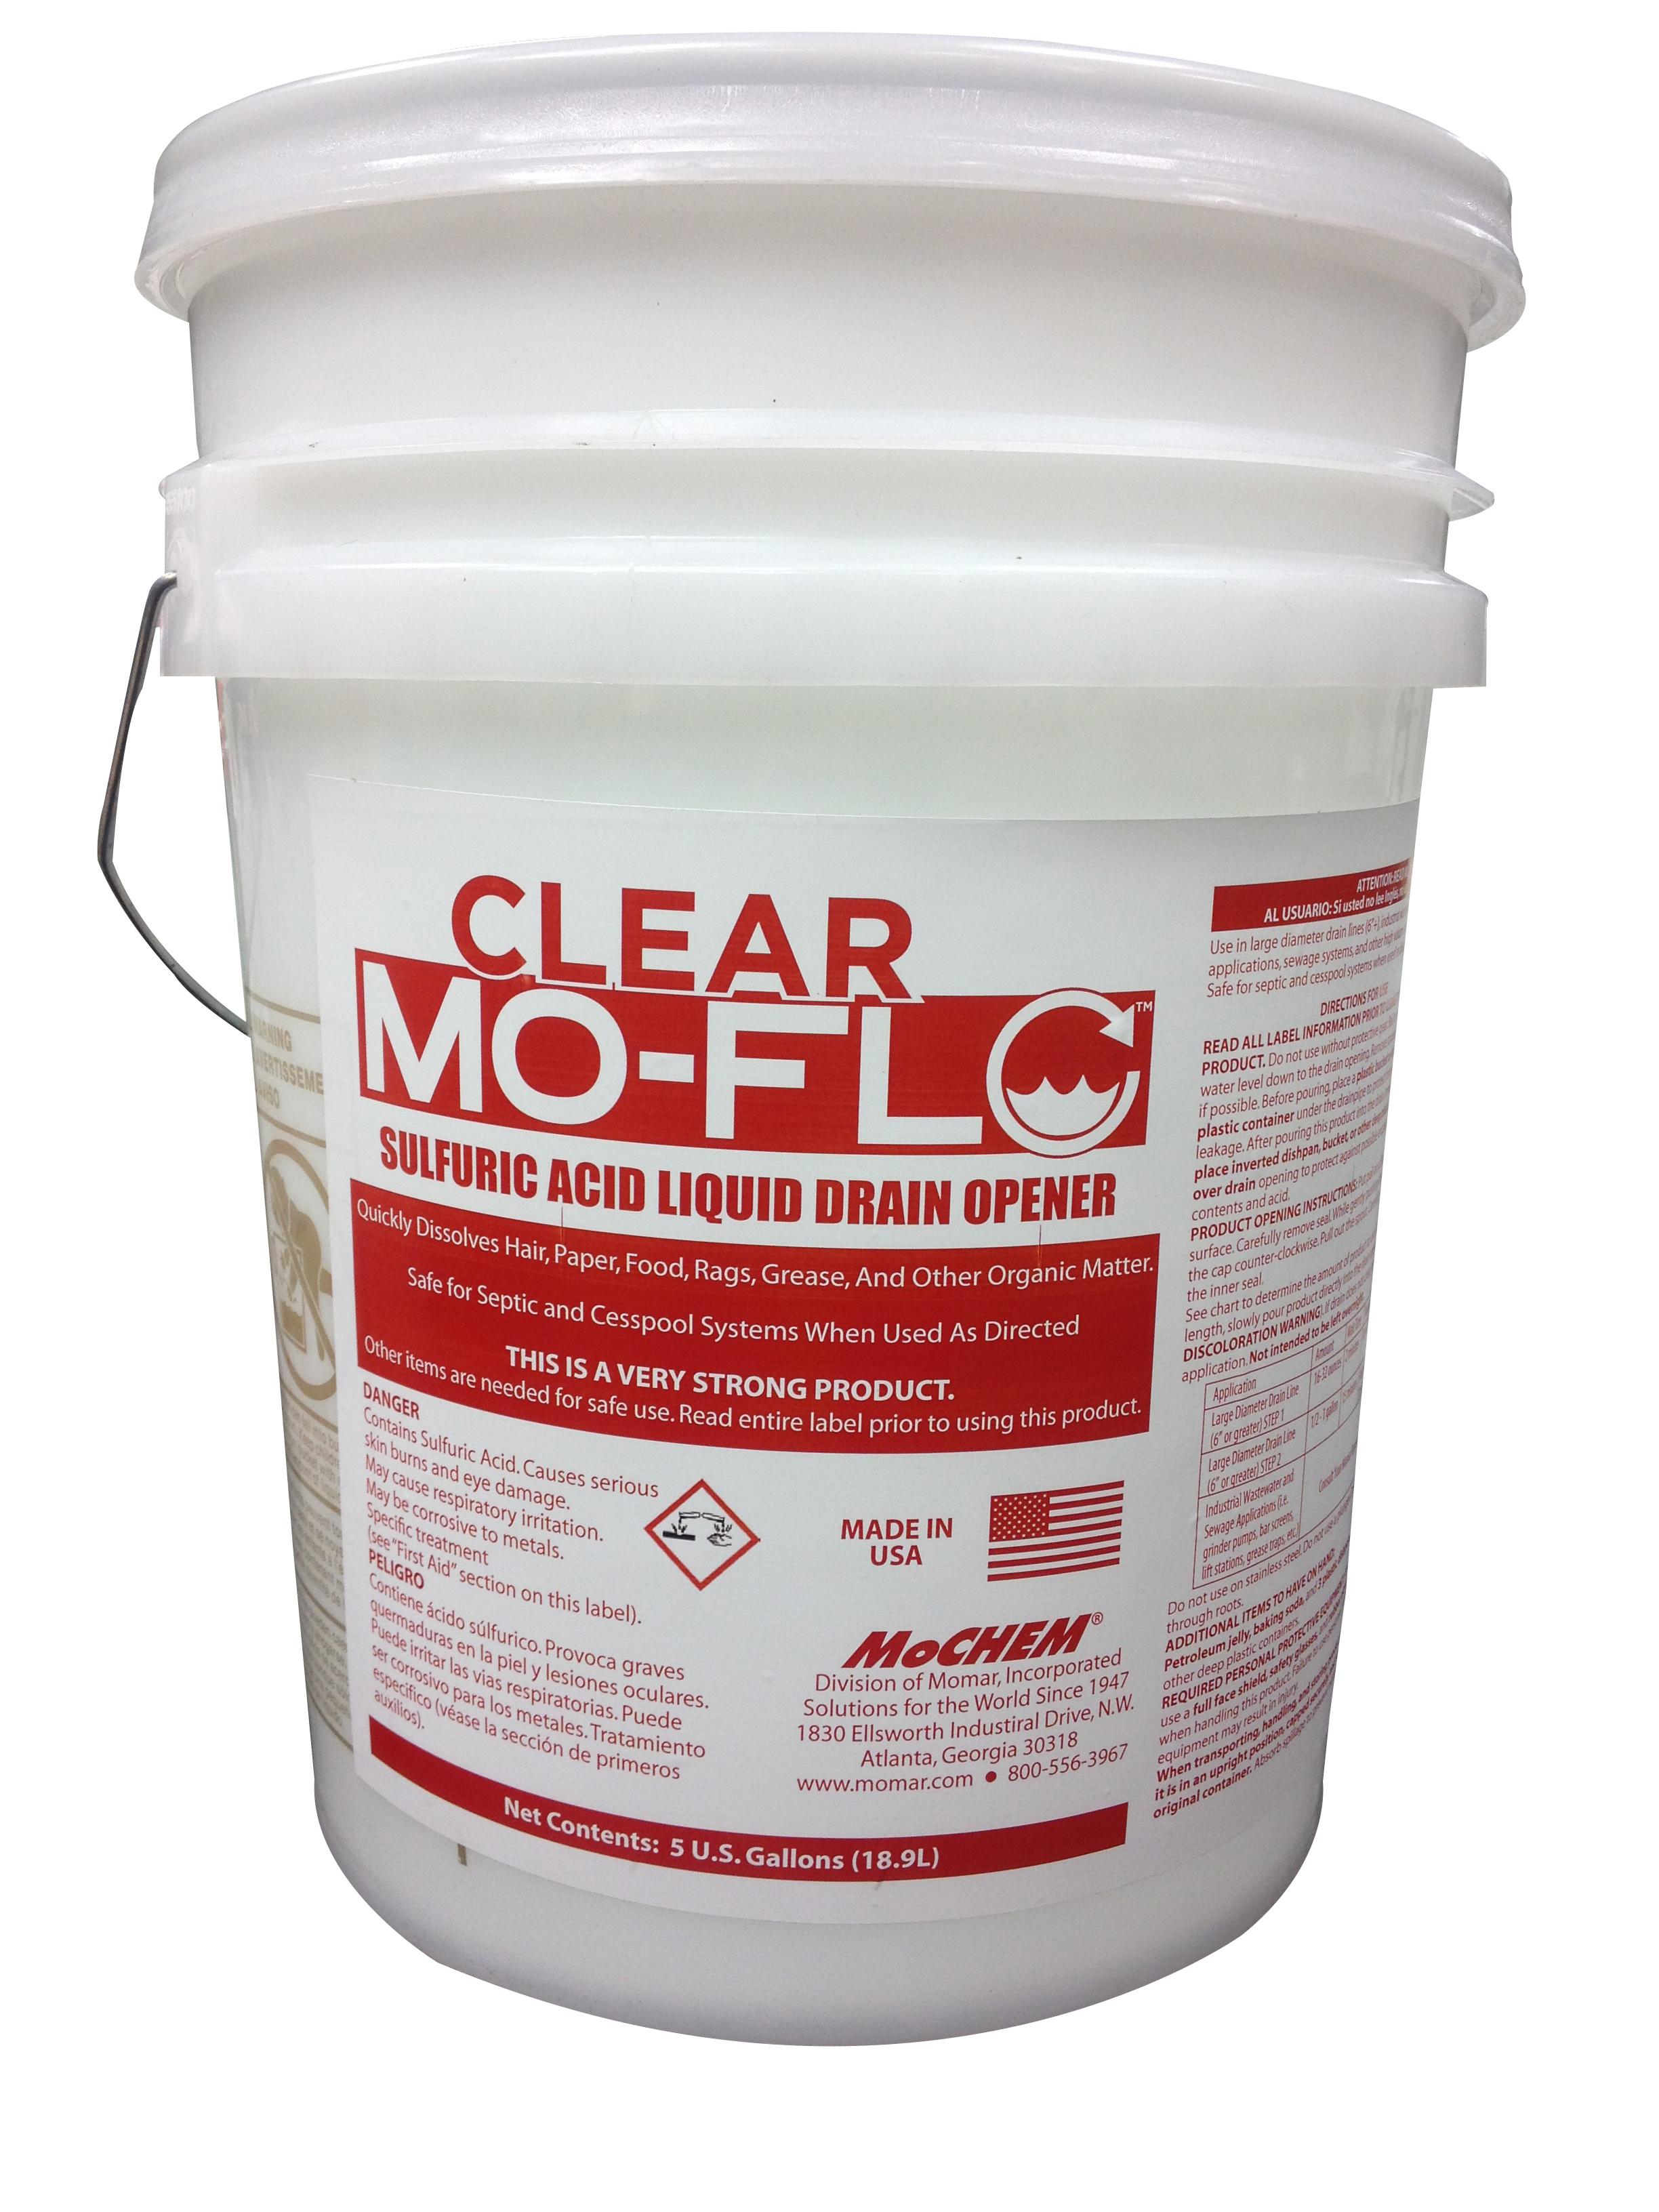 CLEAR MO-FLO